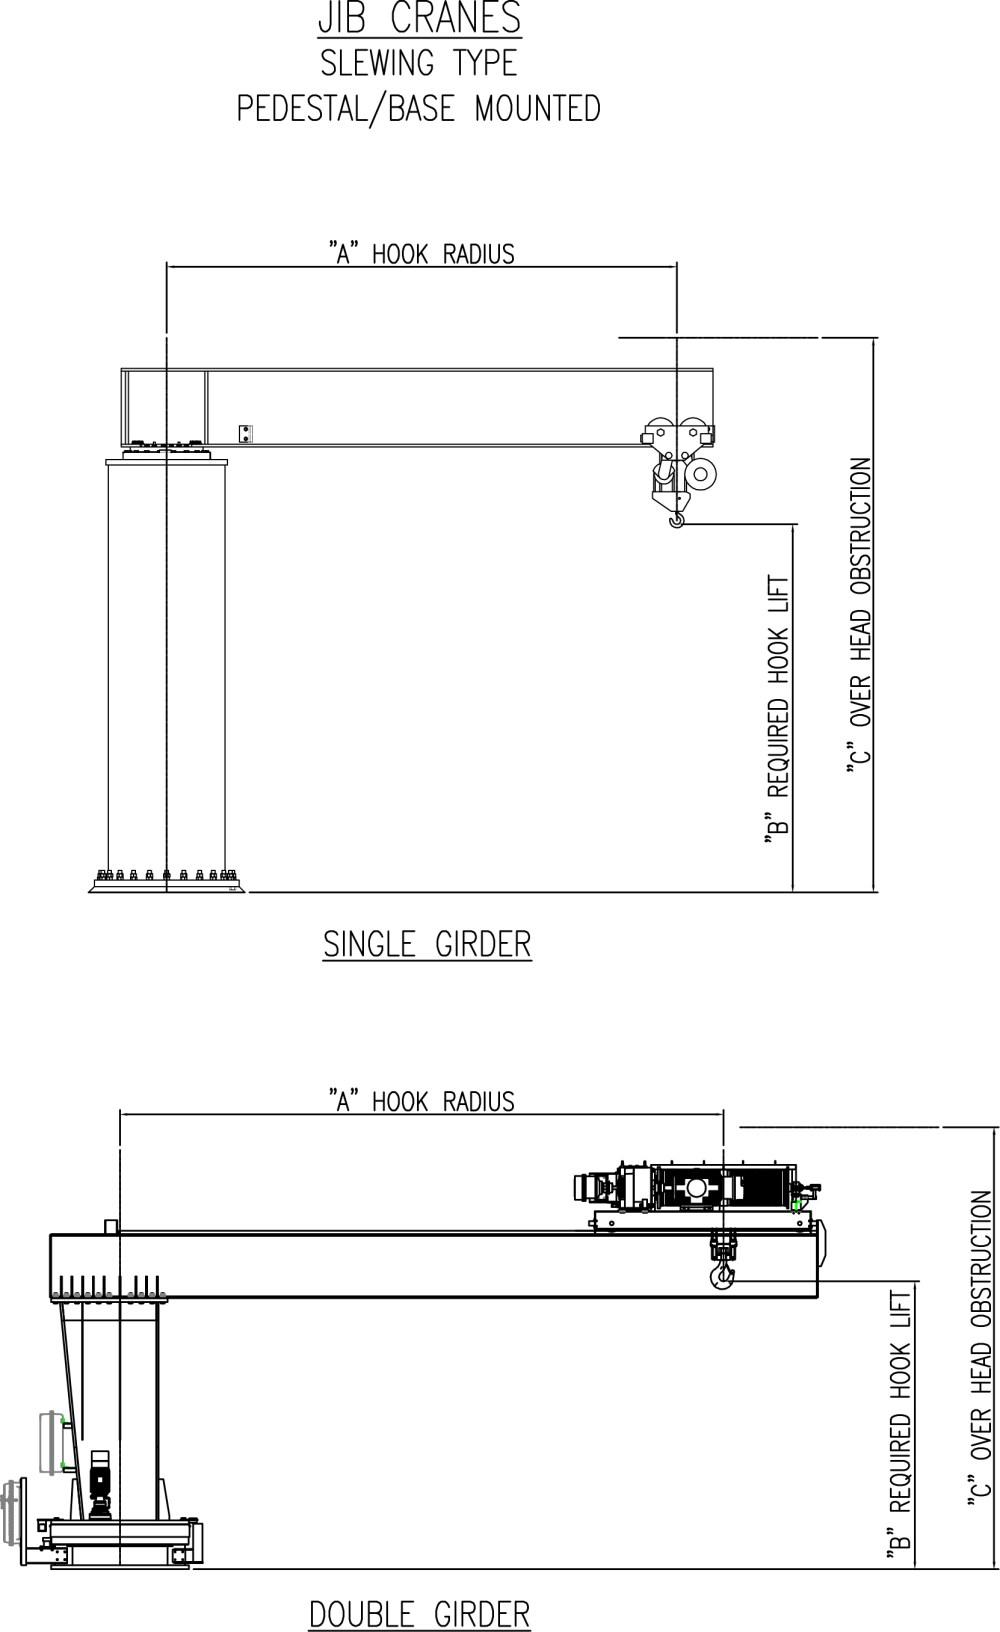 medium resolution of drawing aceco free standing insert mounted cad image jib crane sheet